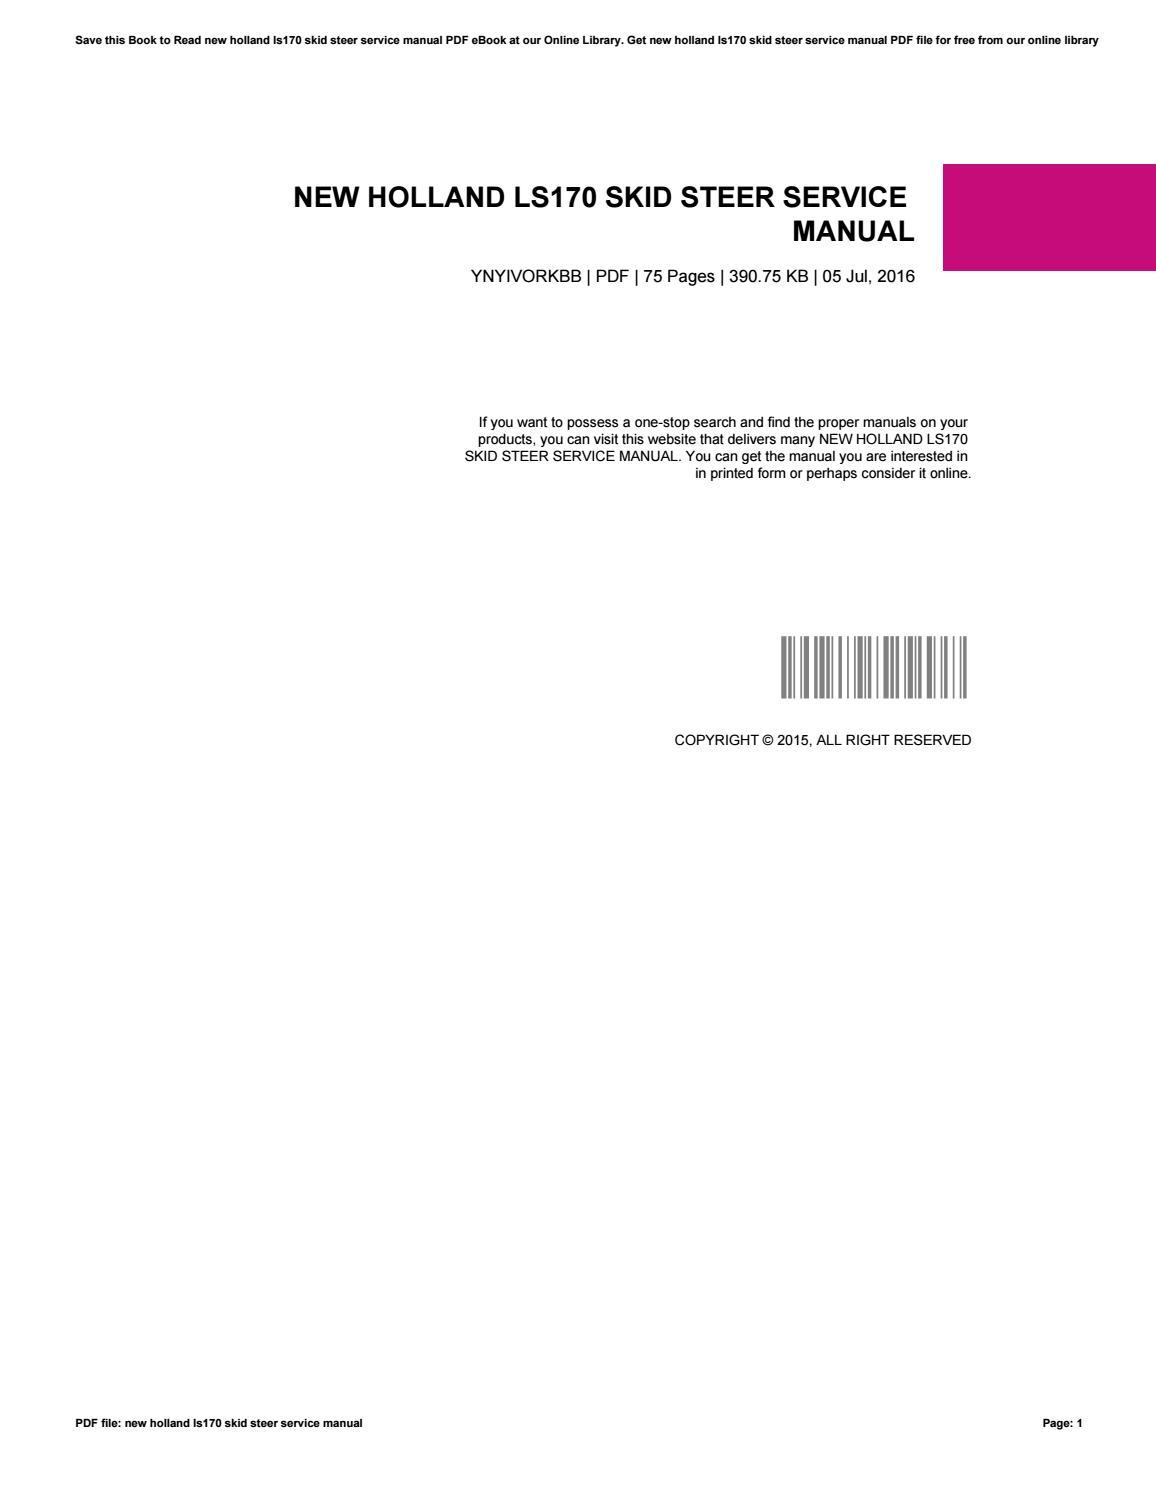 new holland manuals online ebook